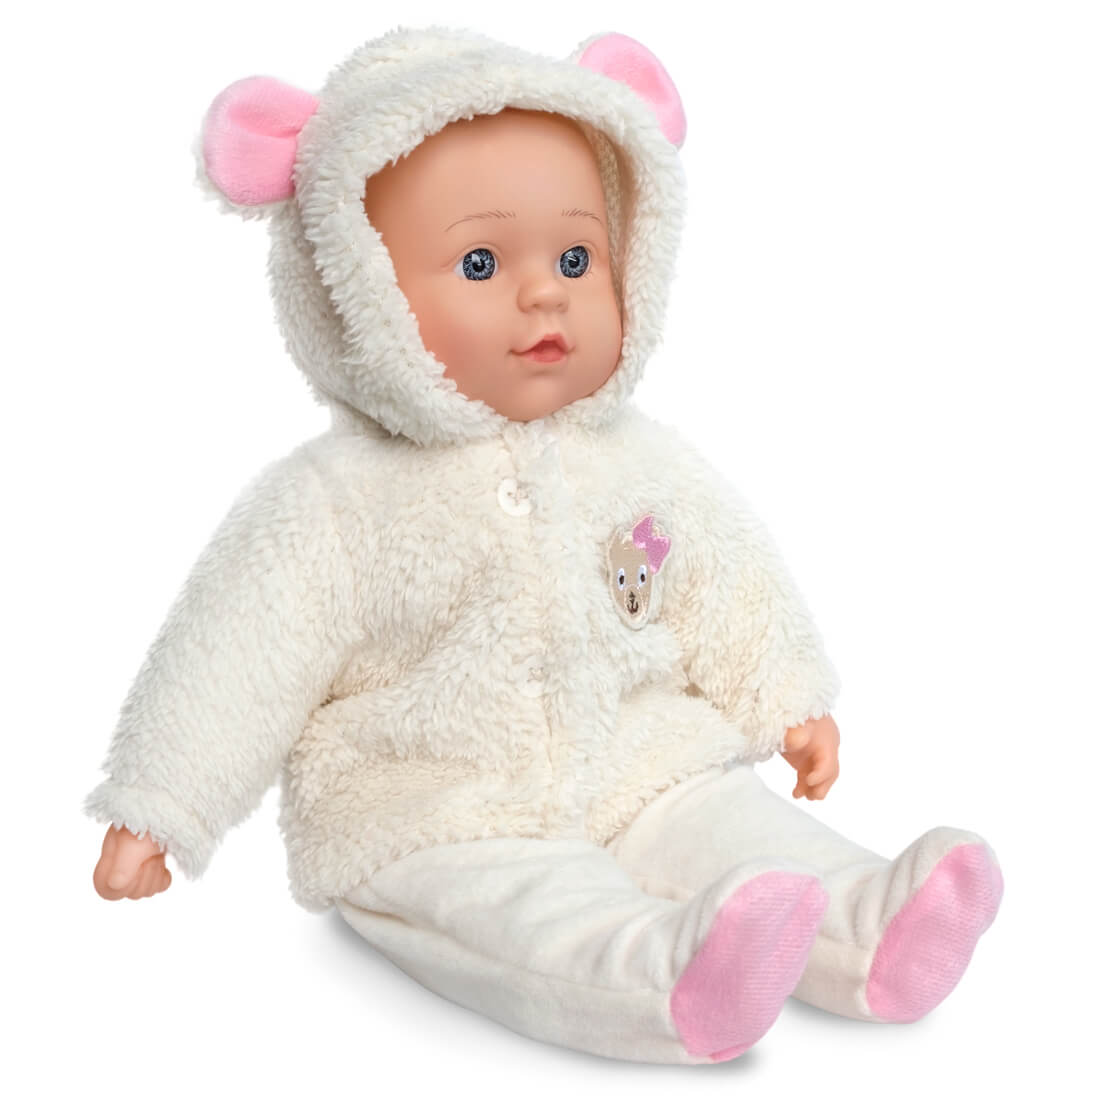 Emma Baby Doll - Triokid | Modern Doll Stroller and Toy